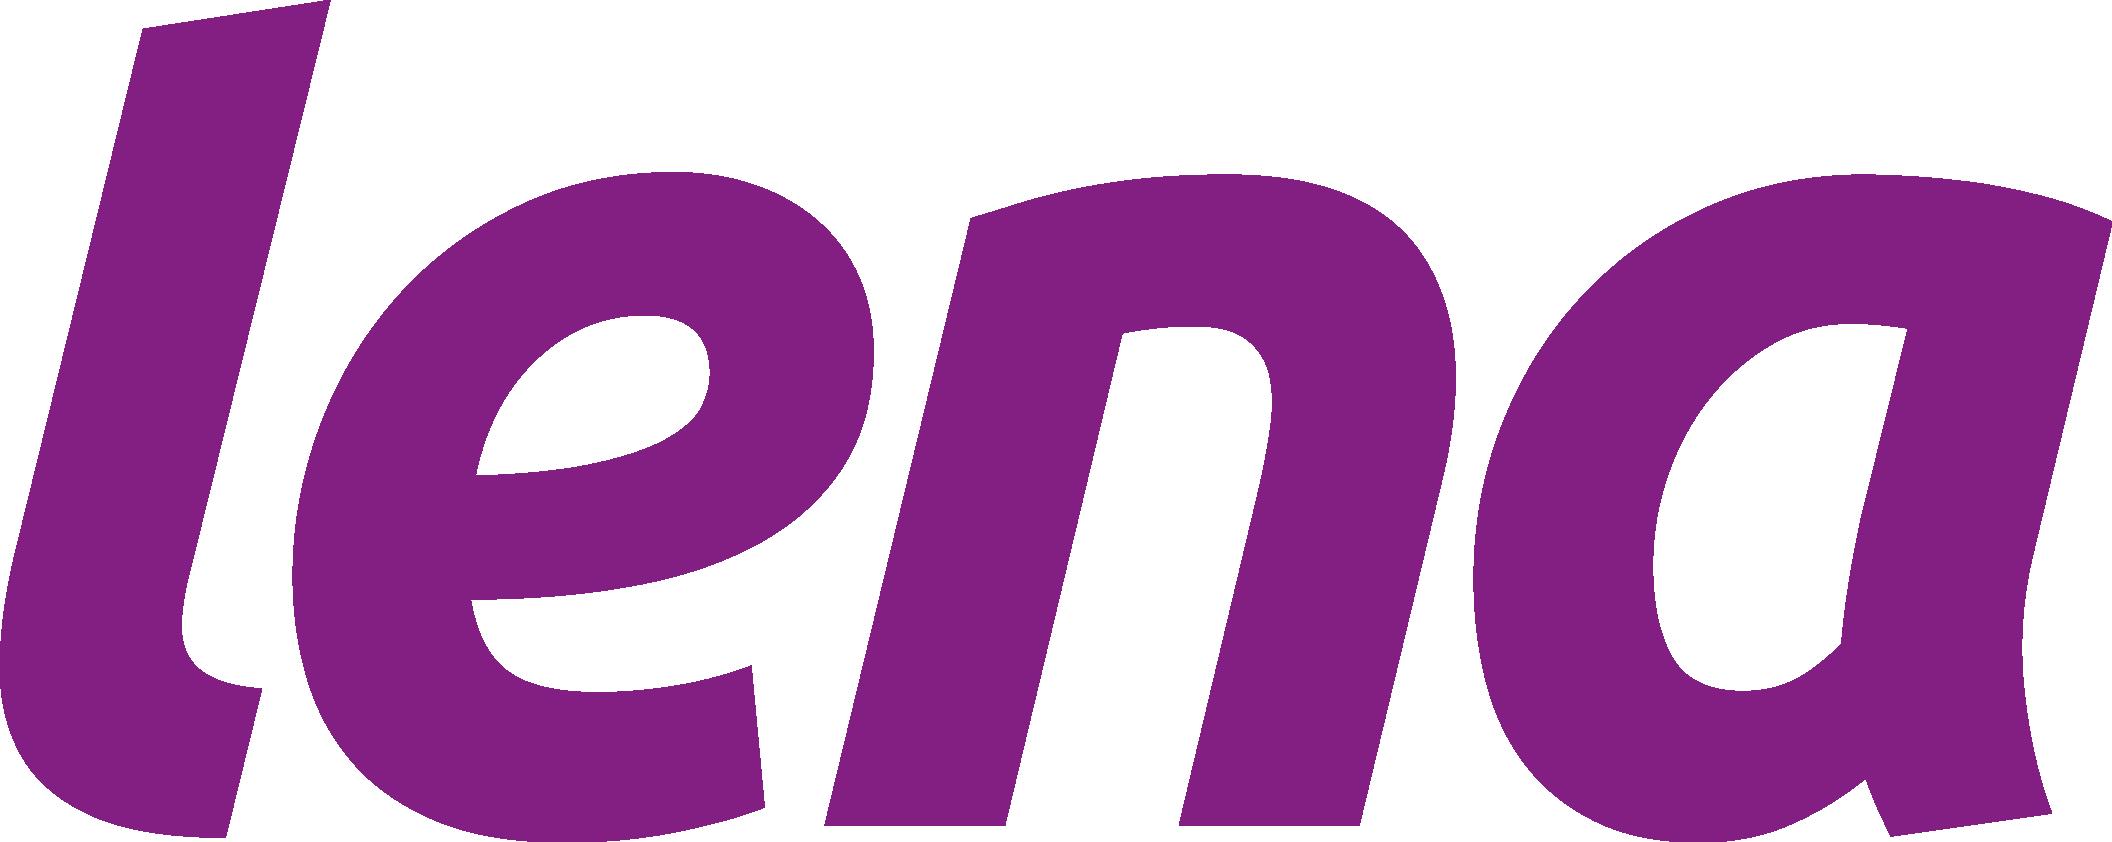 Lena_logo